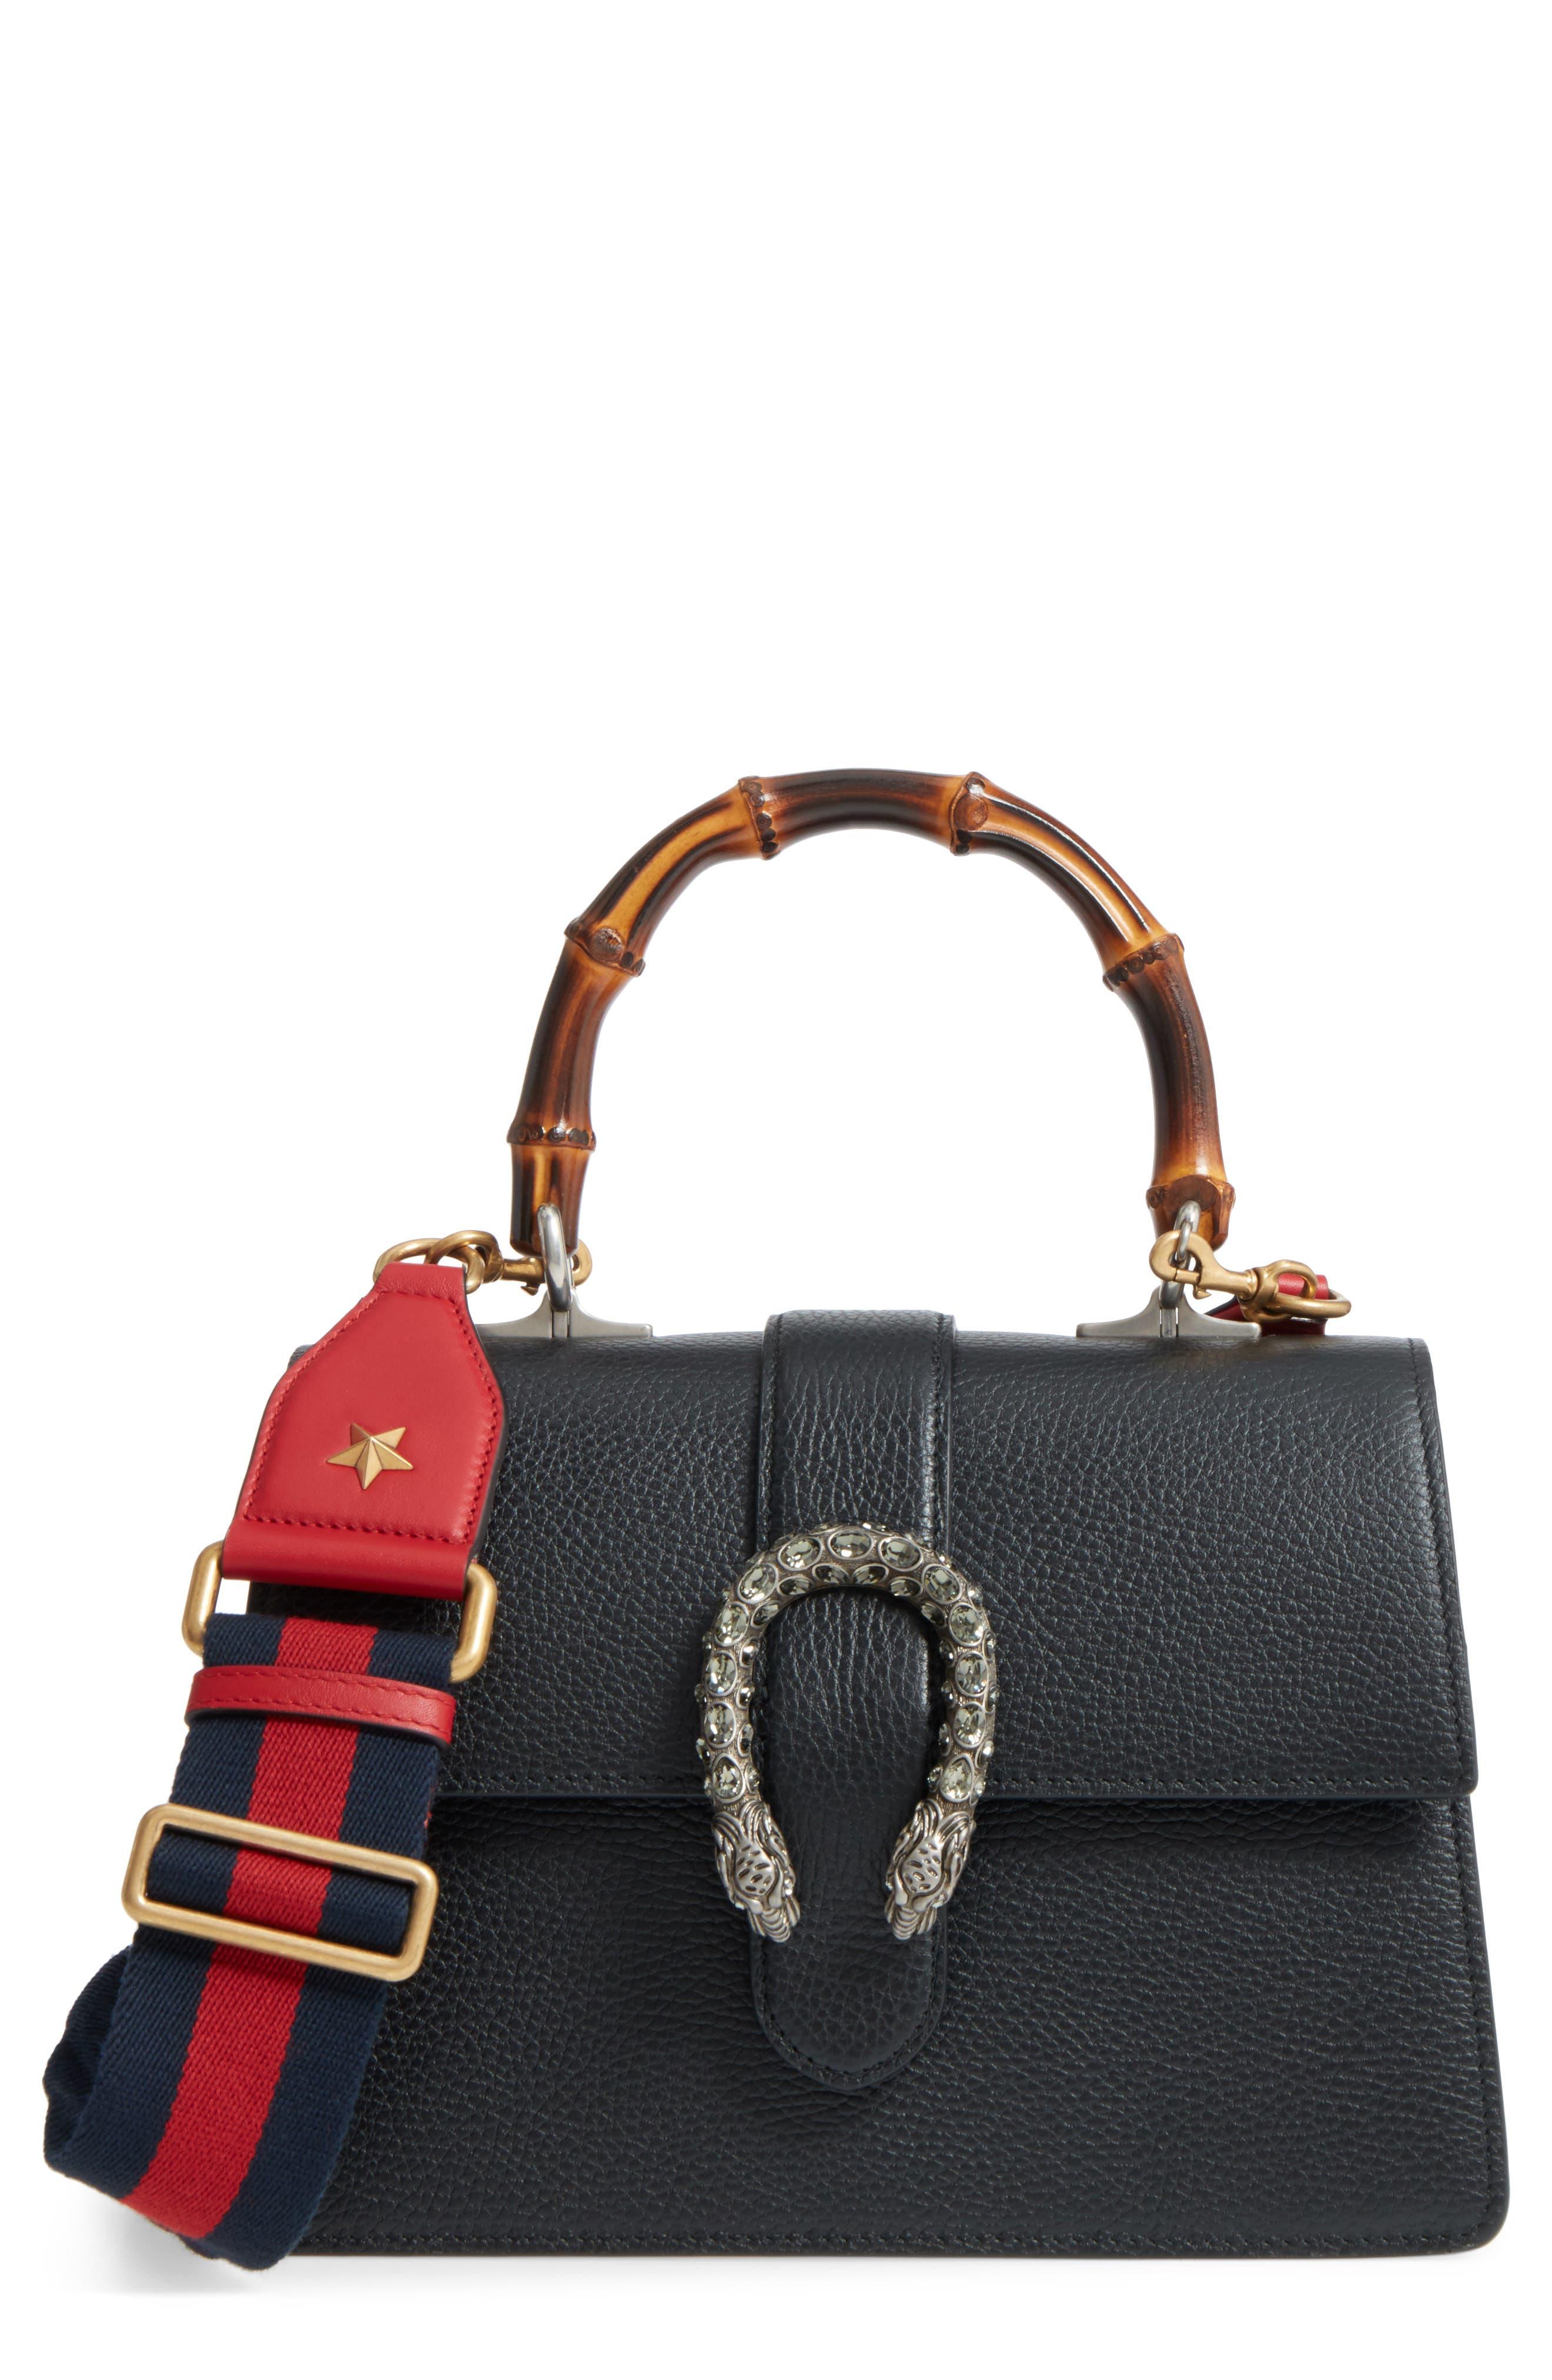 Medium Dionysus Leather Top Handle Satchel,                             Main thumbnail 1, color,                             Nero/ Vrv/ Black Diamond